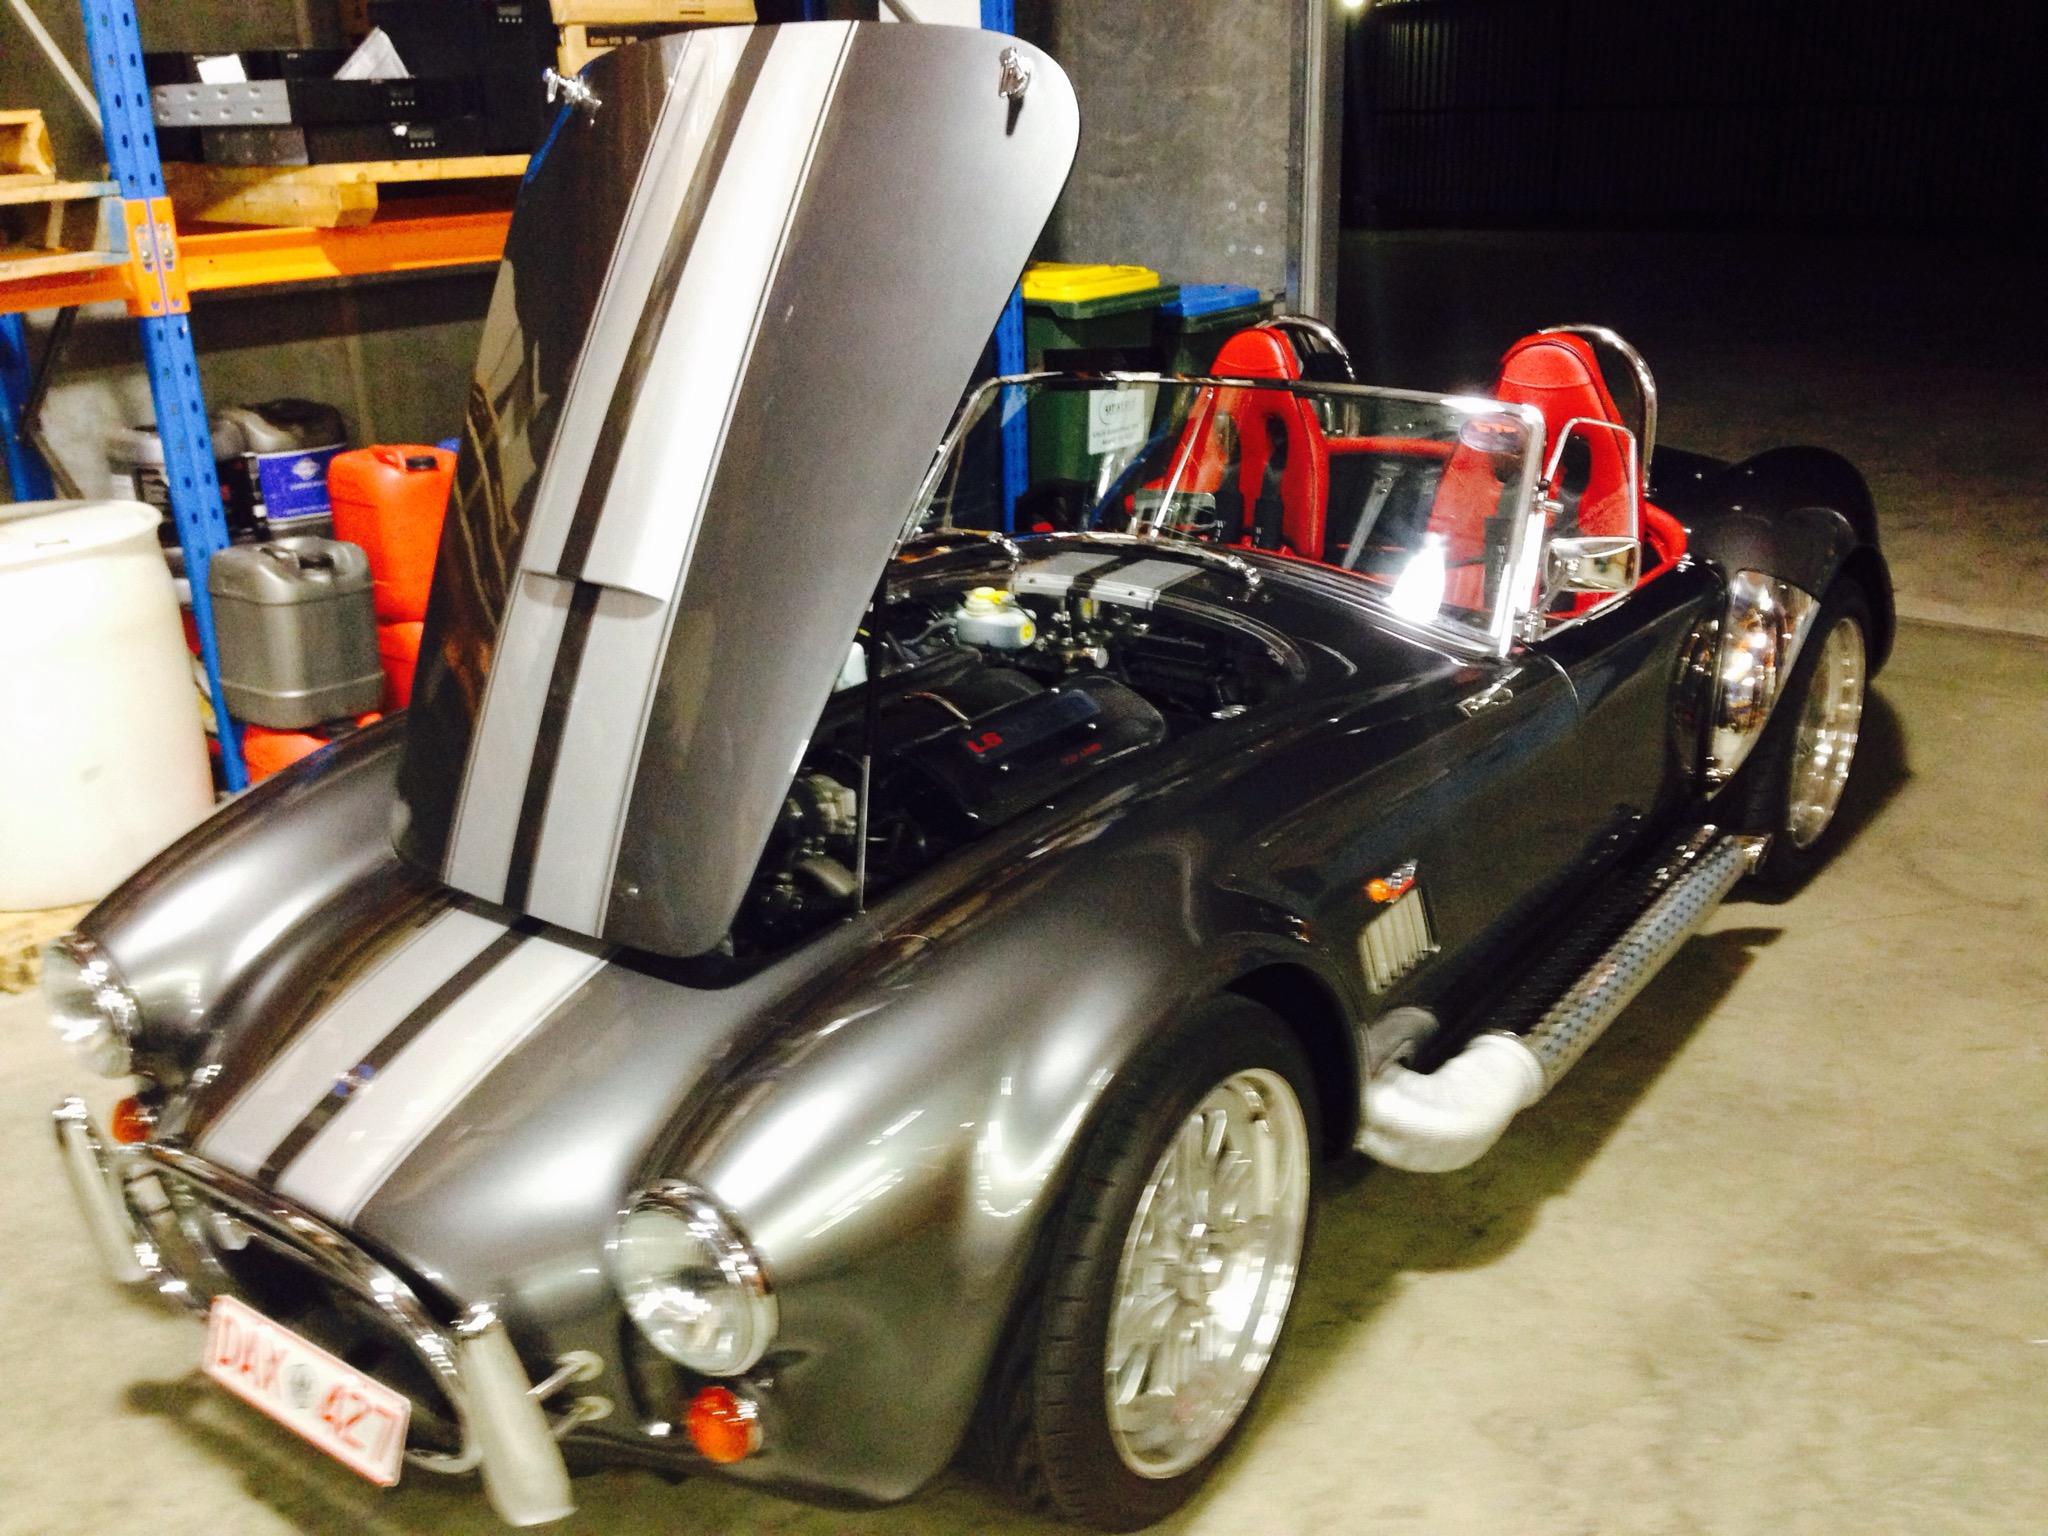 5w20 Vs 5w30 >> Cobra Car Club SA ULX110 Motor Oil – Engine Oil, Gear Oil